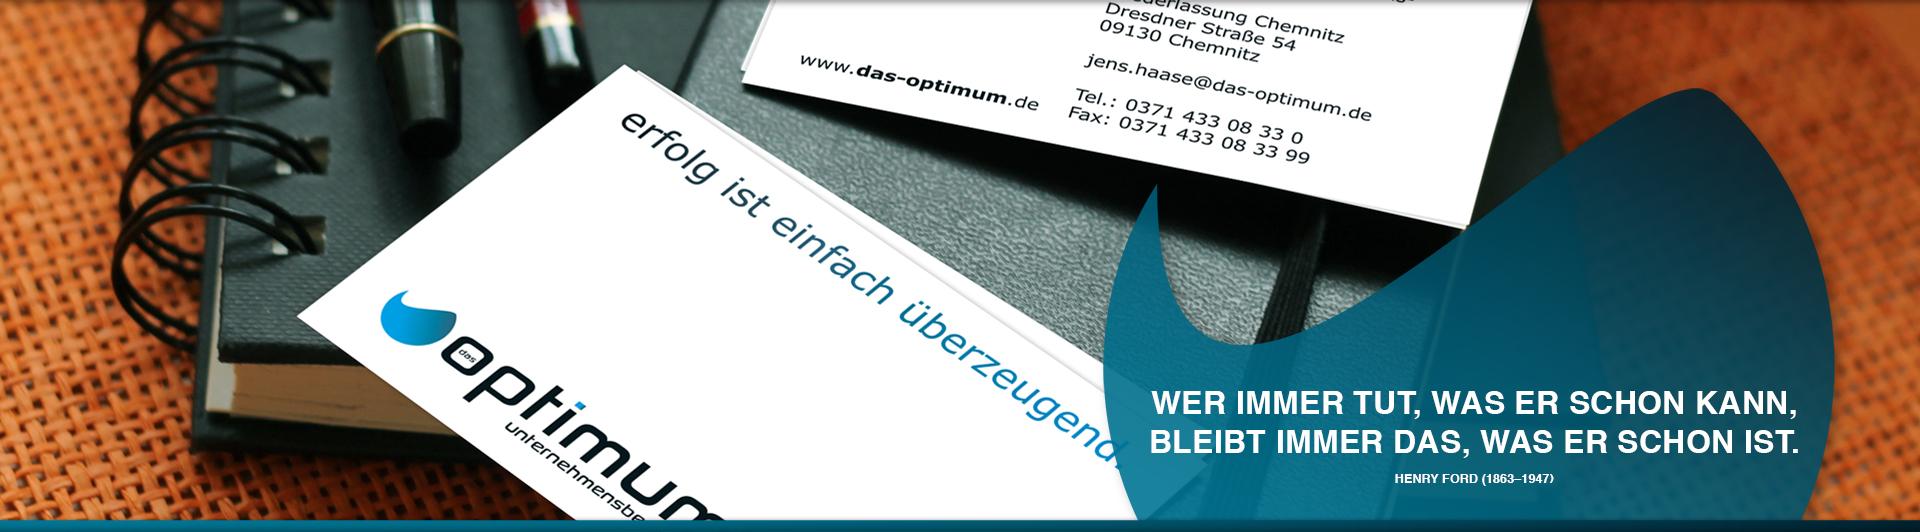 Home_Unternehmensberatung_das_Optimum_slide_4